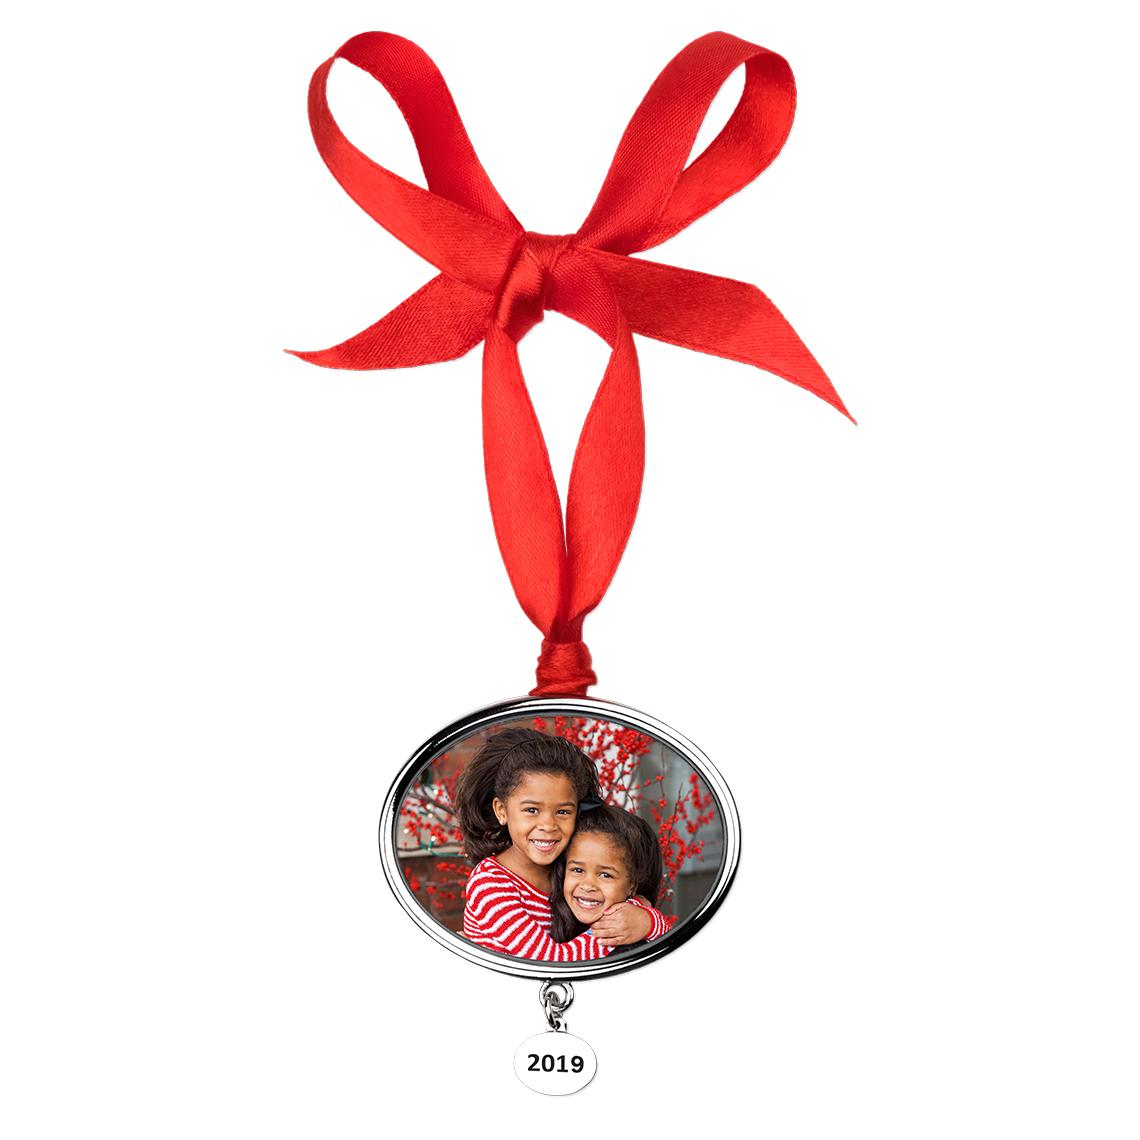 Ornaments Christmas.2019 Christmas Photo Ornament